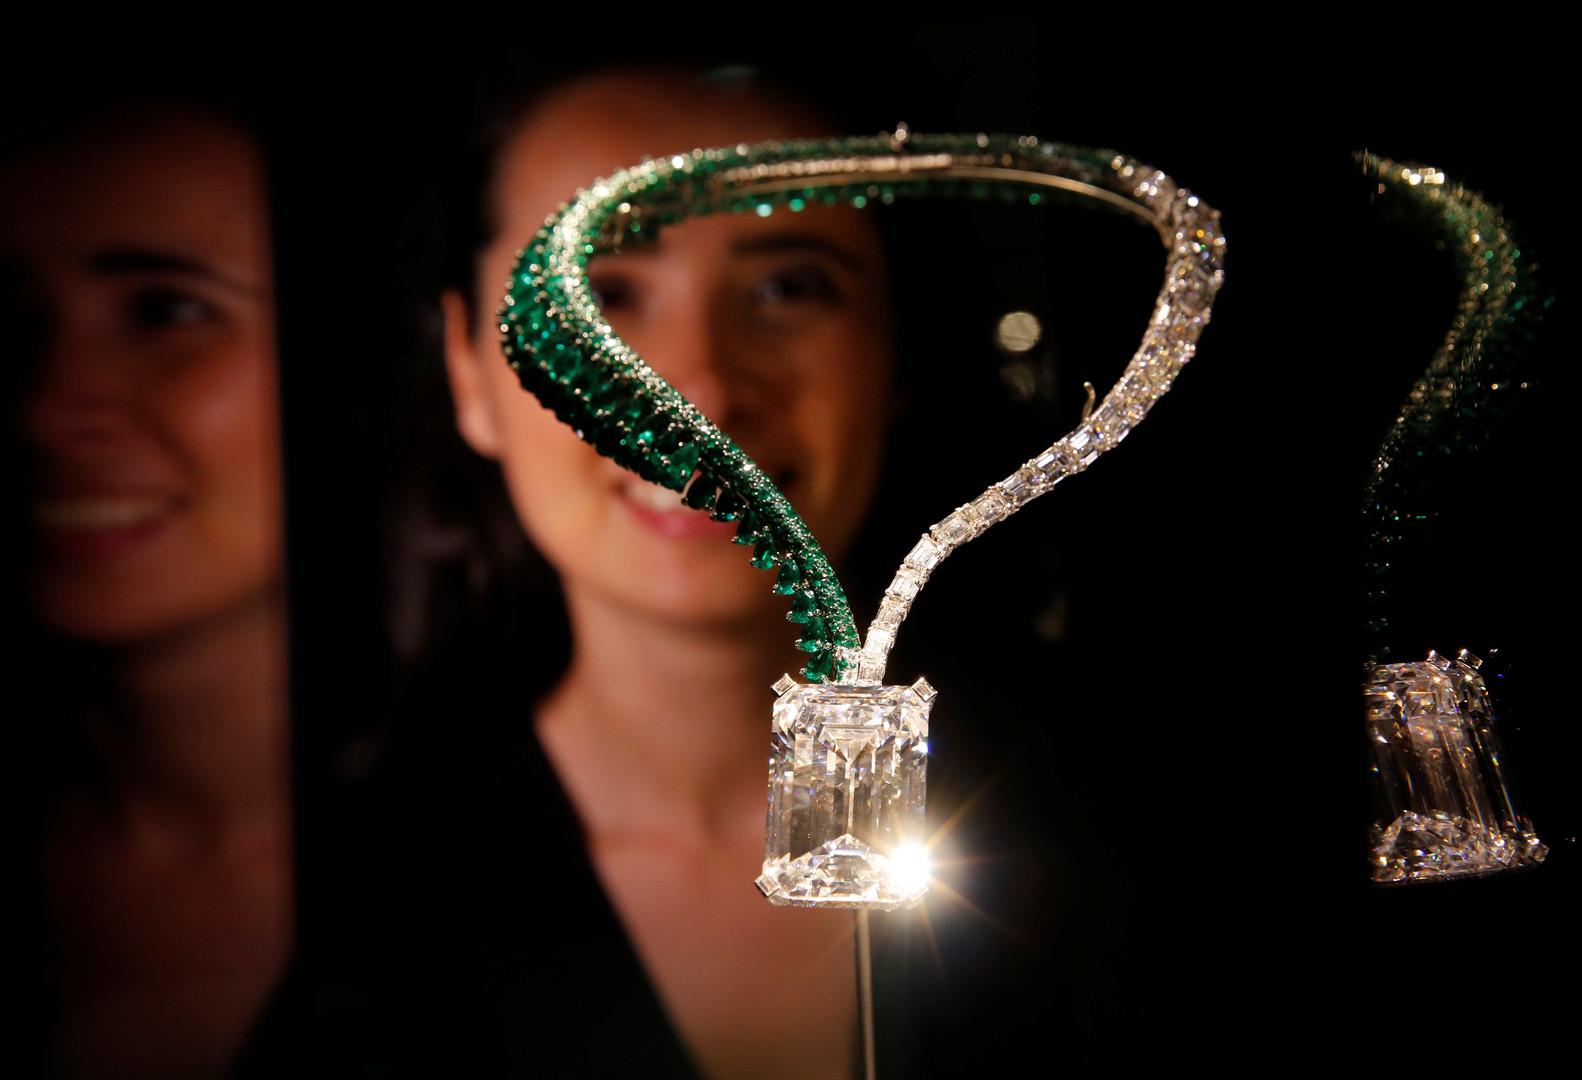 Крупнейший вмире бриллиант продан зарекордную сумму